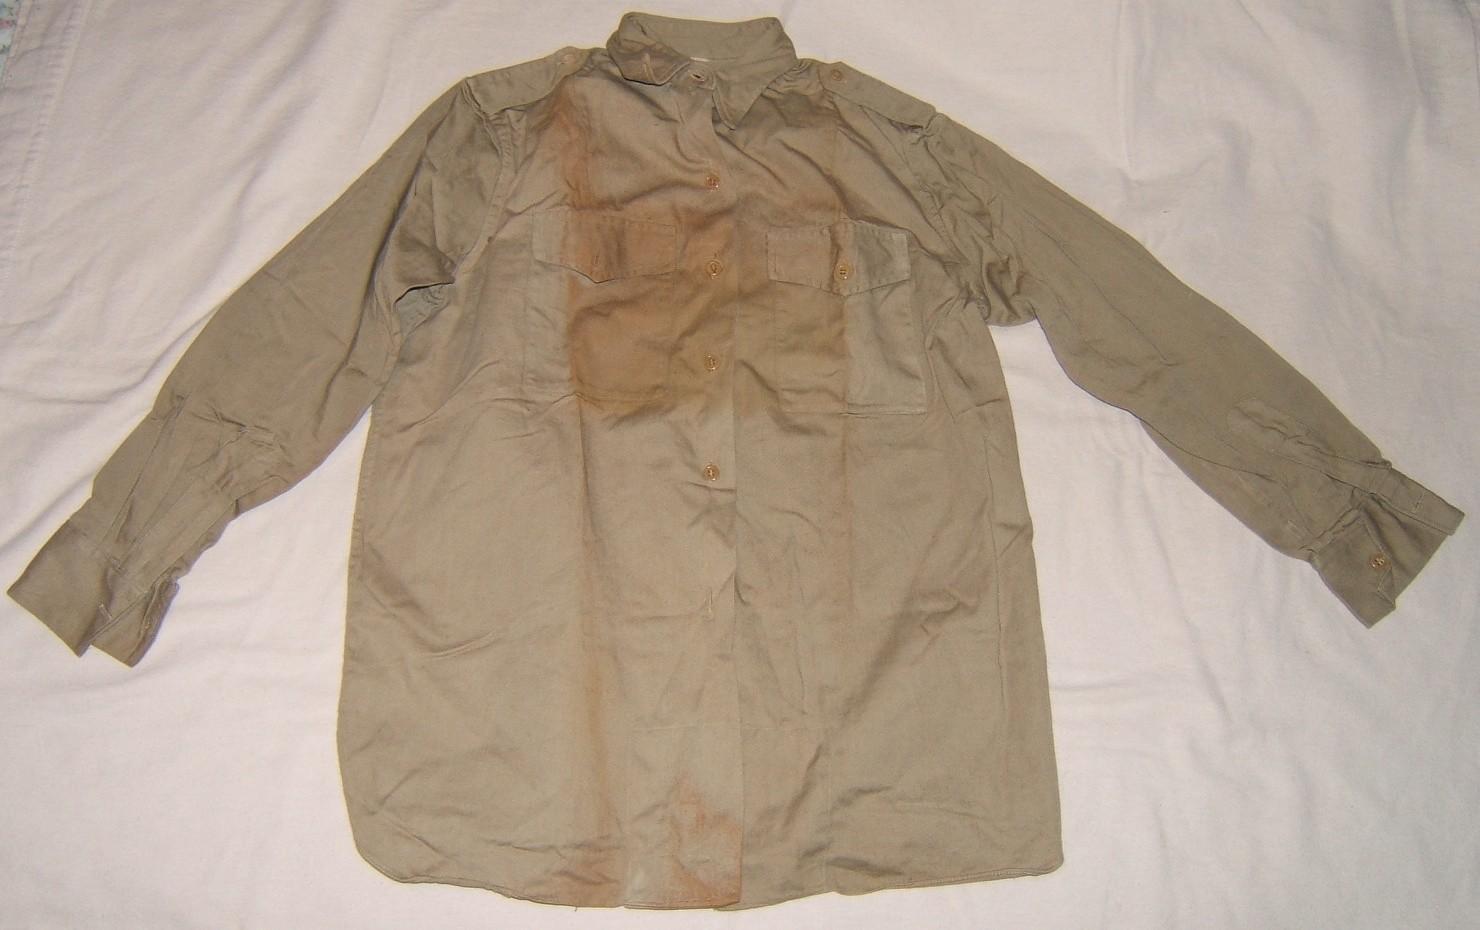 Israeli Army (Israeli-made?) battledress shirt in khaki, 1950